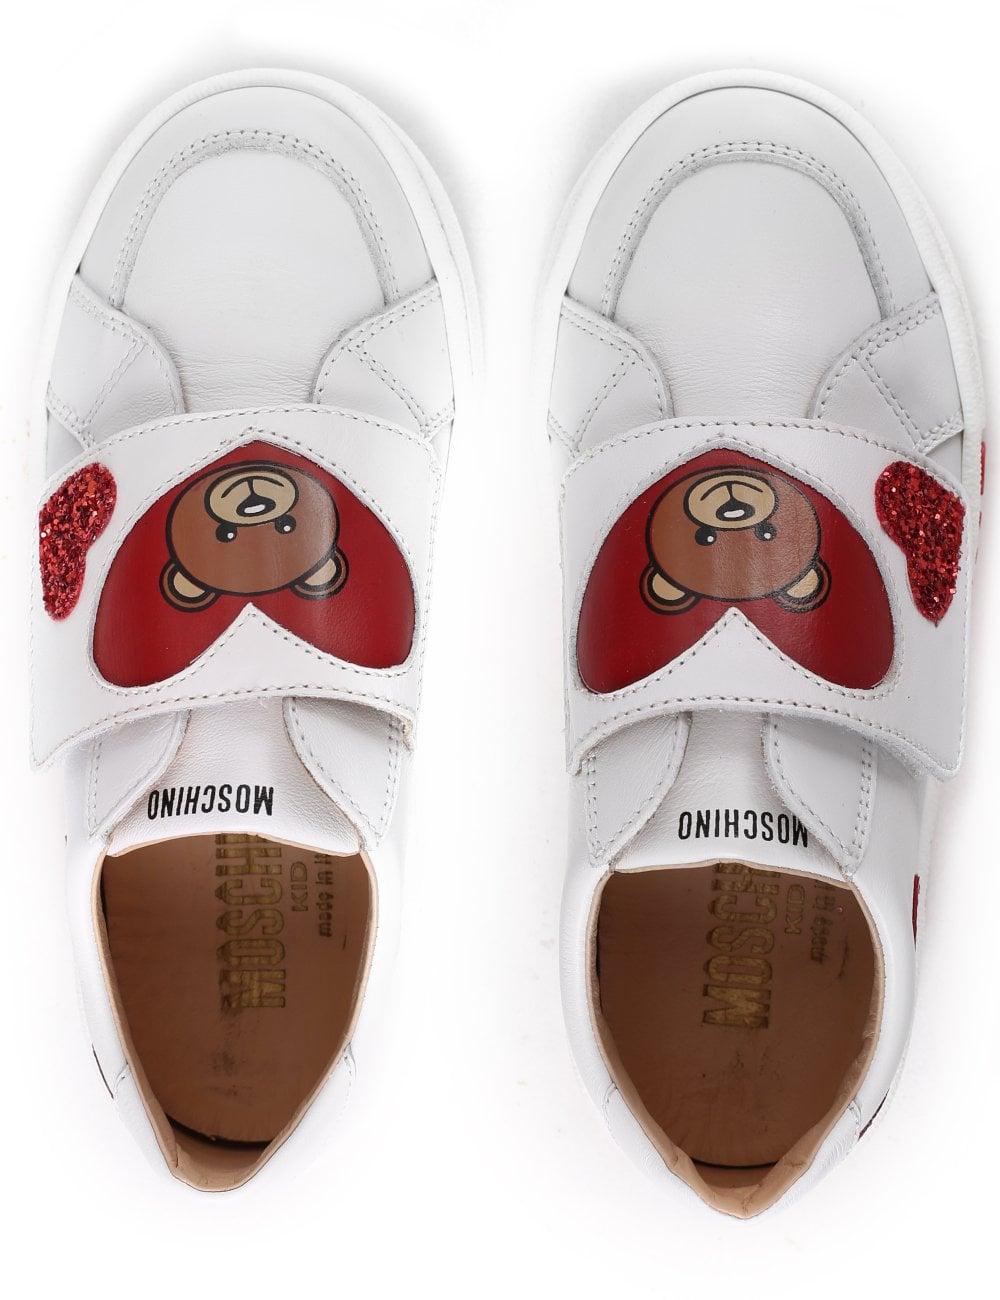 fbfb8c6a2 Moschino Girls Velcro Teddy Trainer